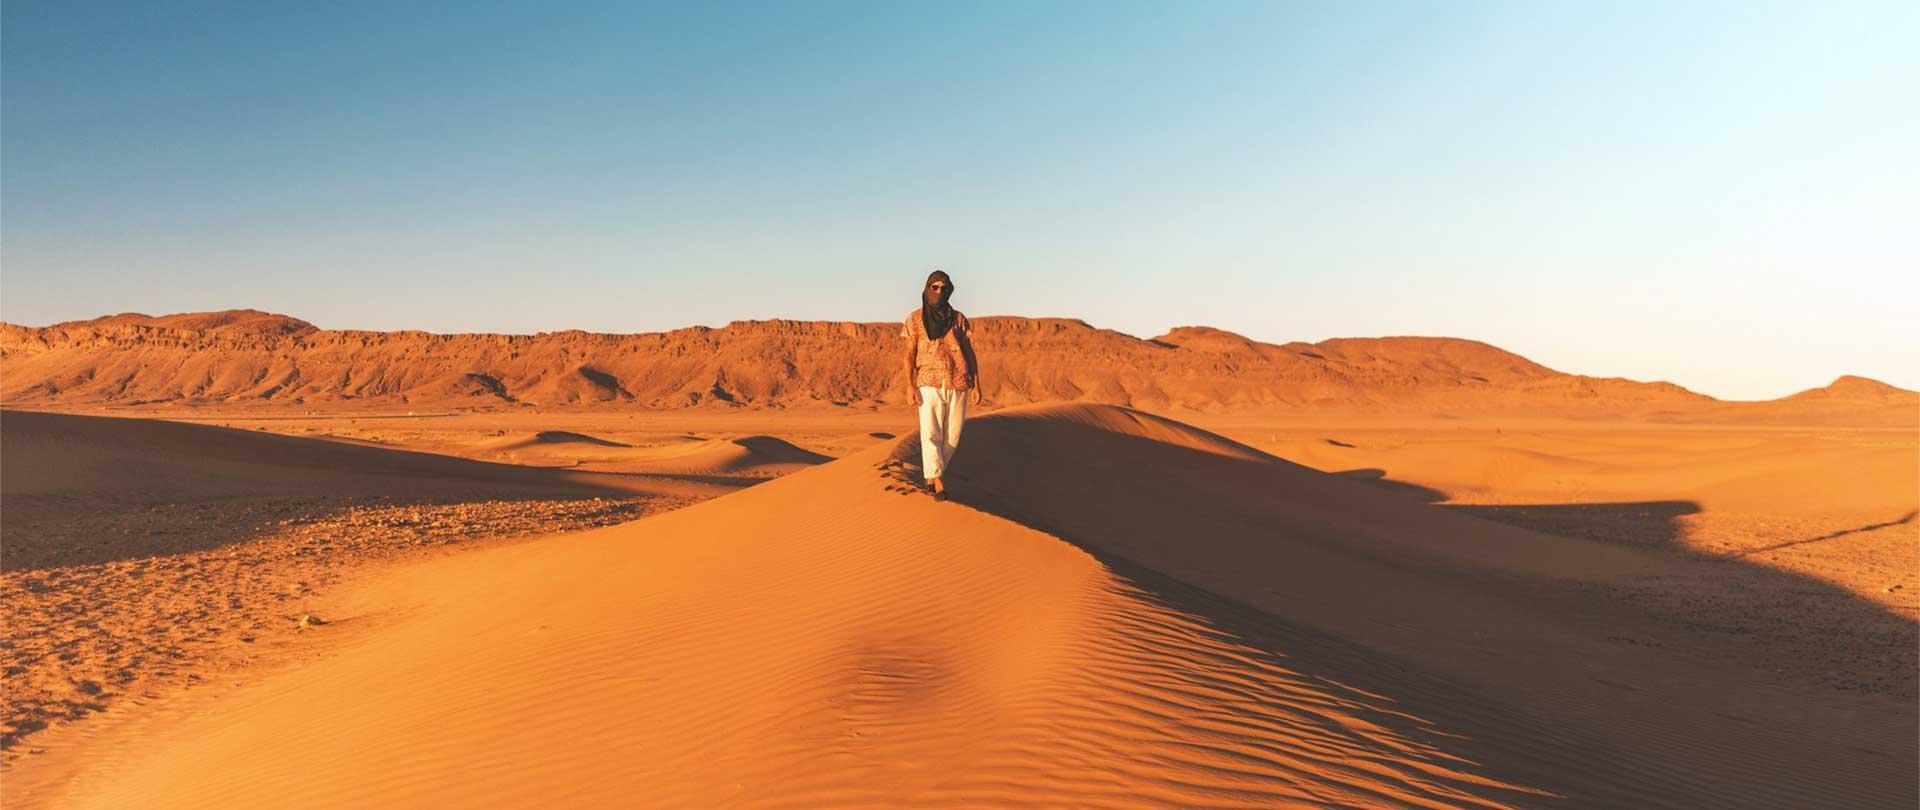 2 Day tour from Marrakech to Zagora Desert